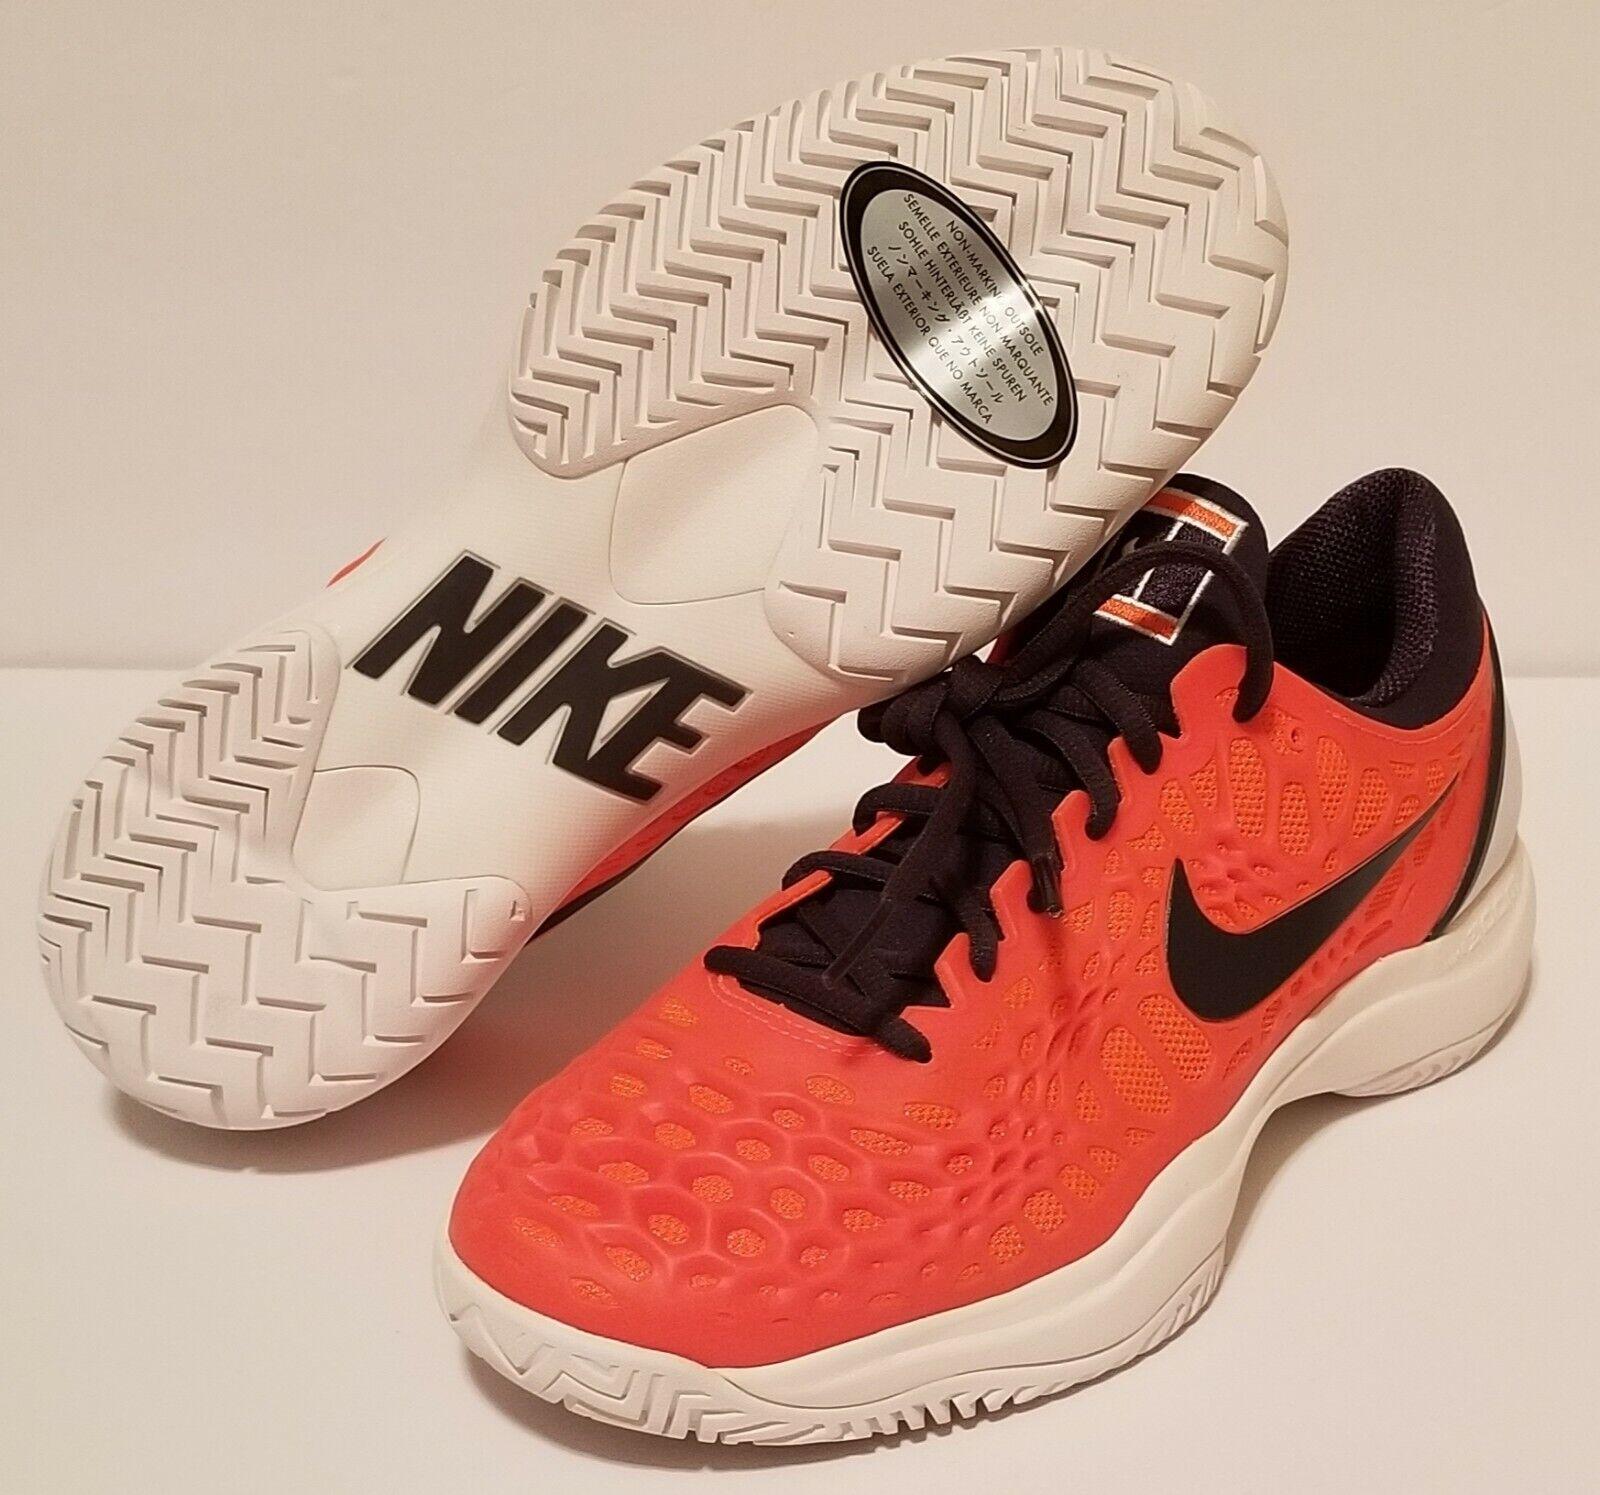 Nike Nikecourt Premier Rafael Nadal Premier Men S Tennis Jacket For Sale Online Ebay